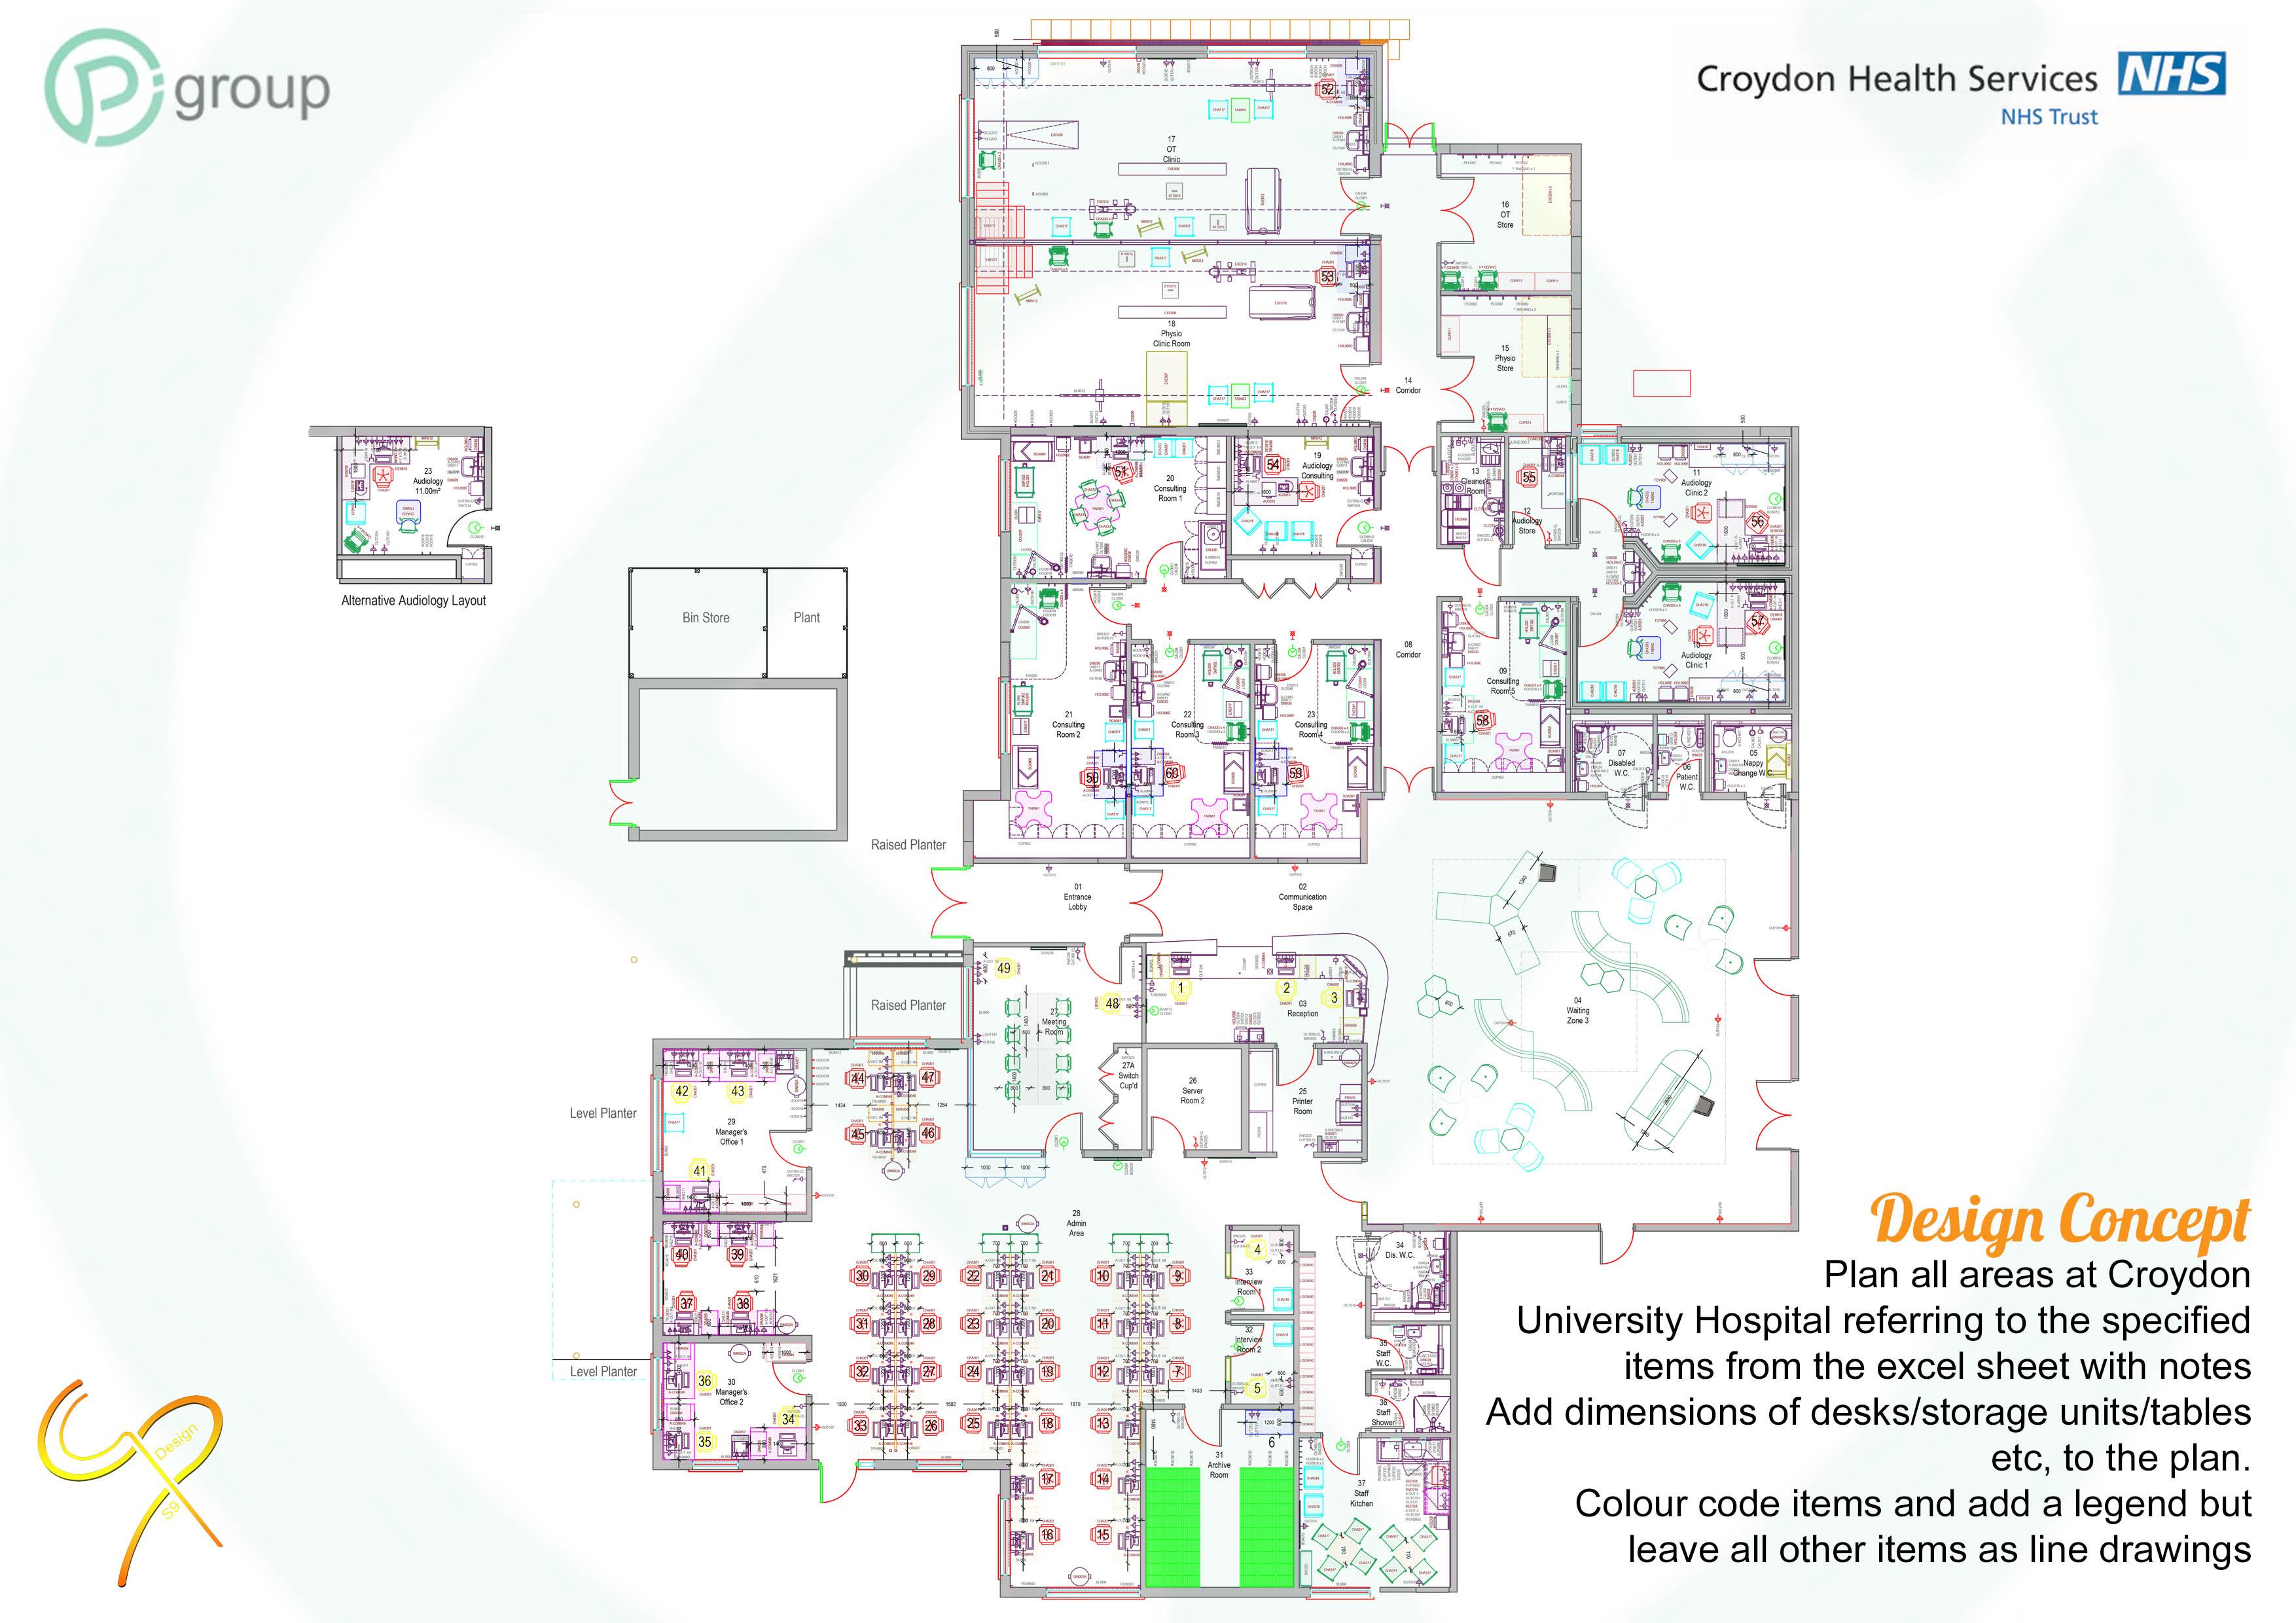 Pi Group - Croydon University Hospital